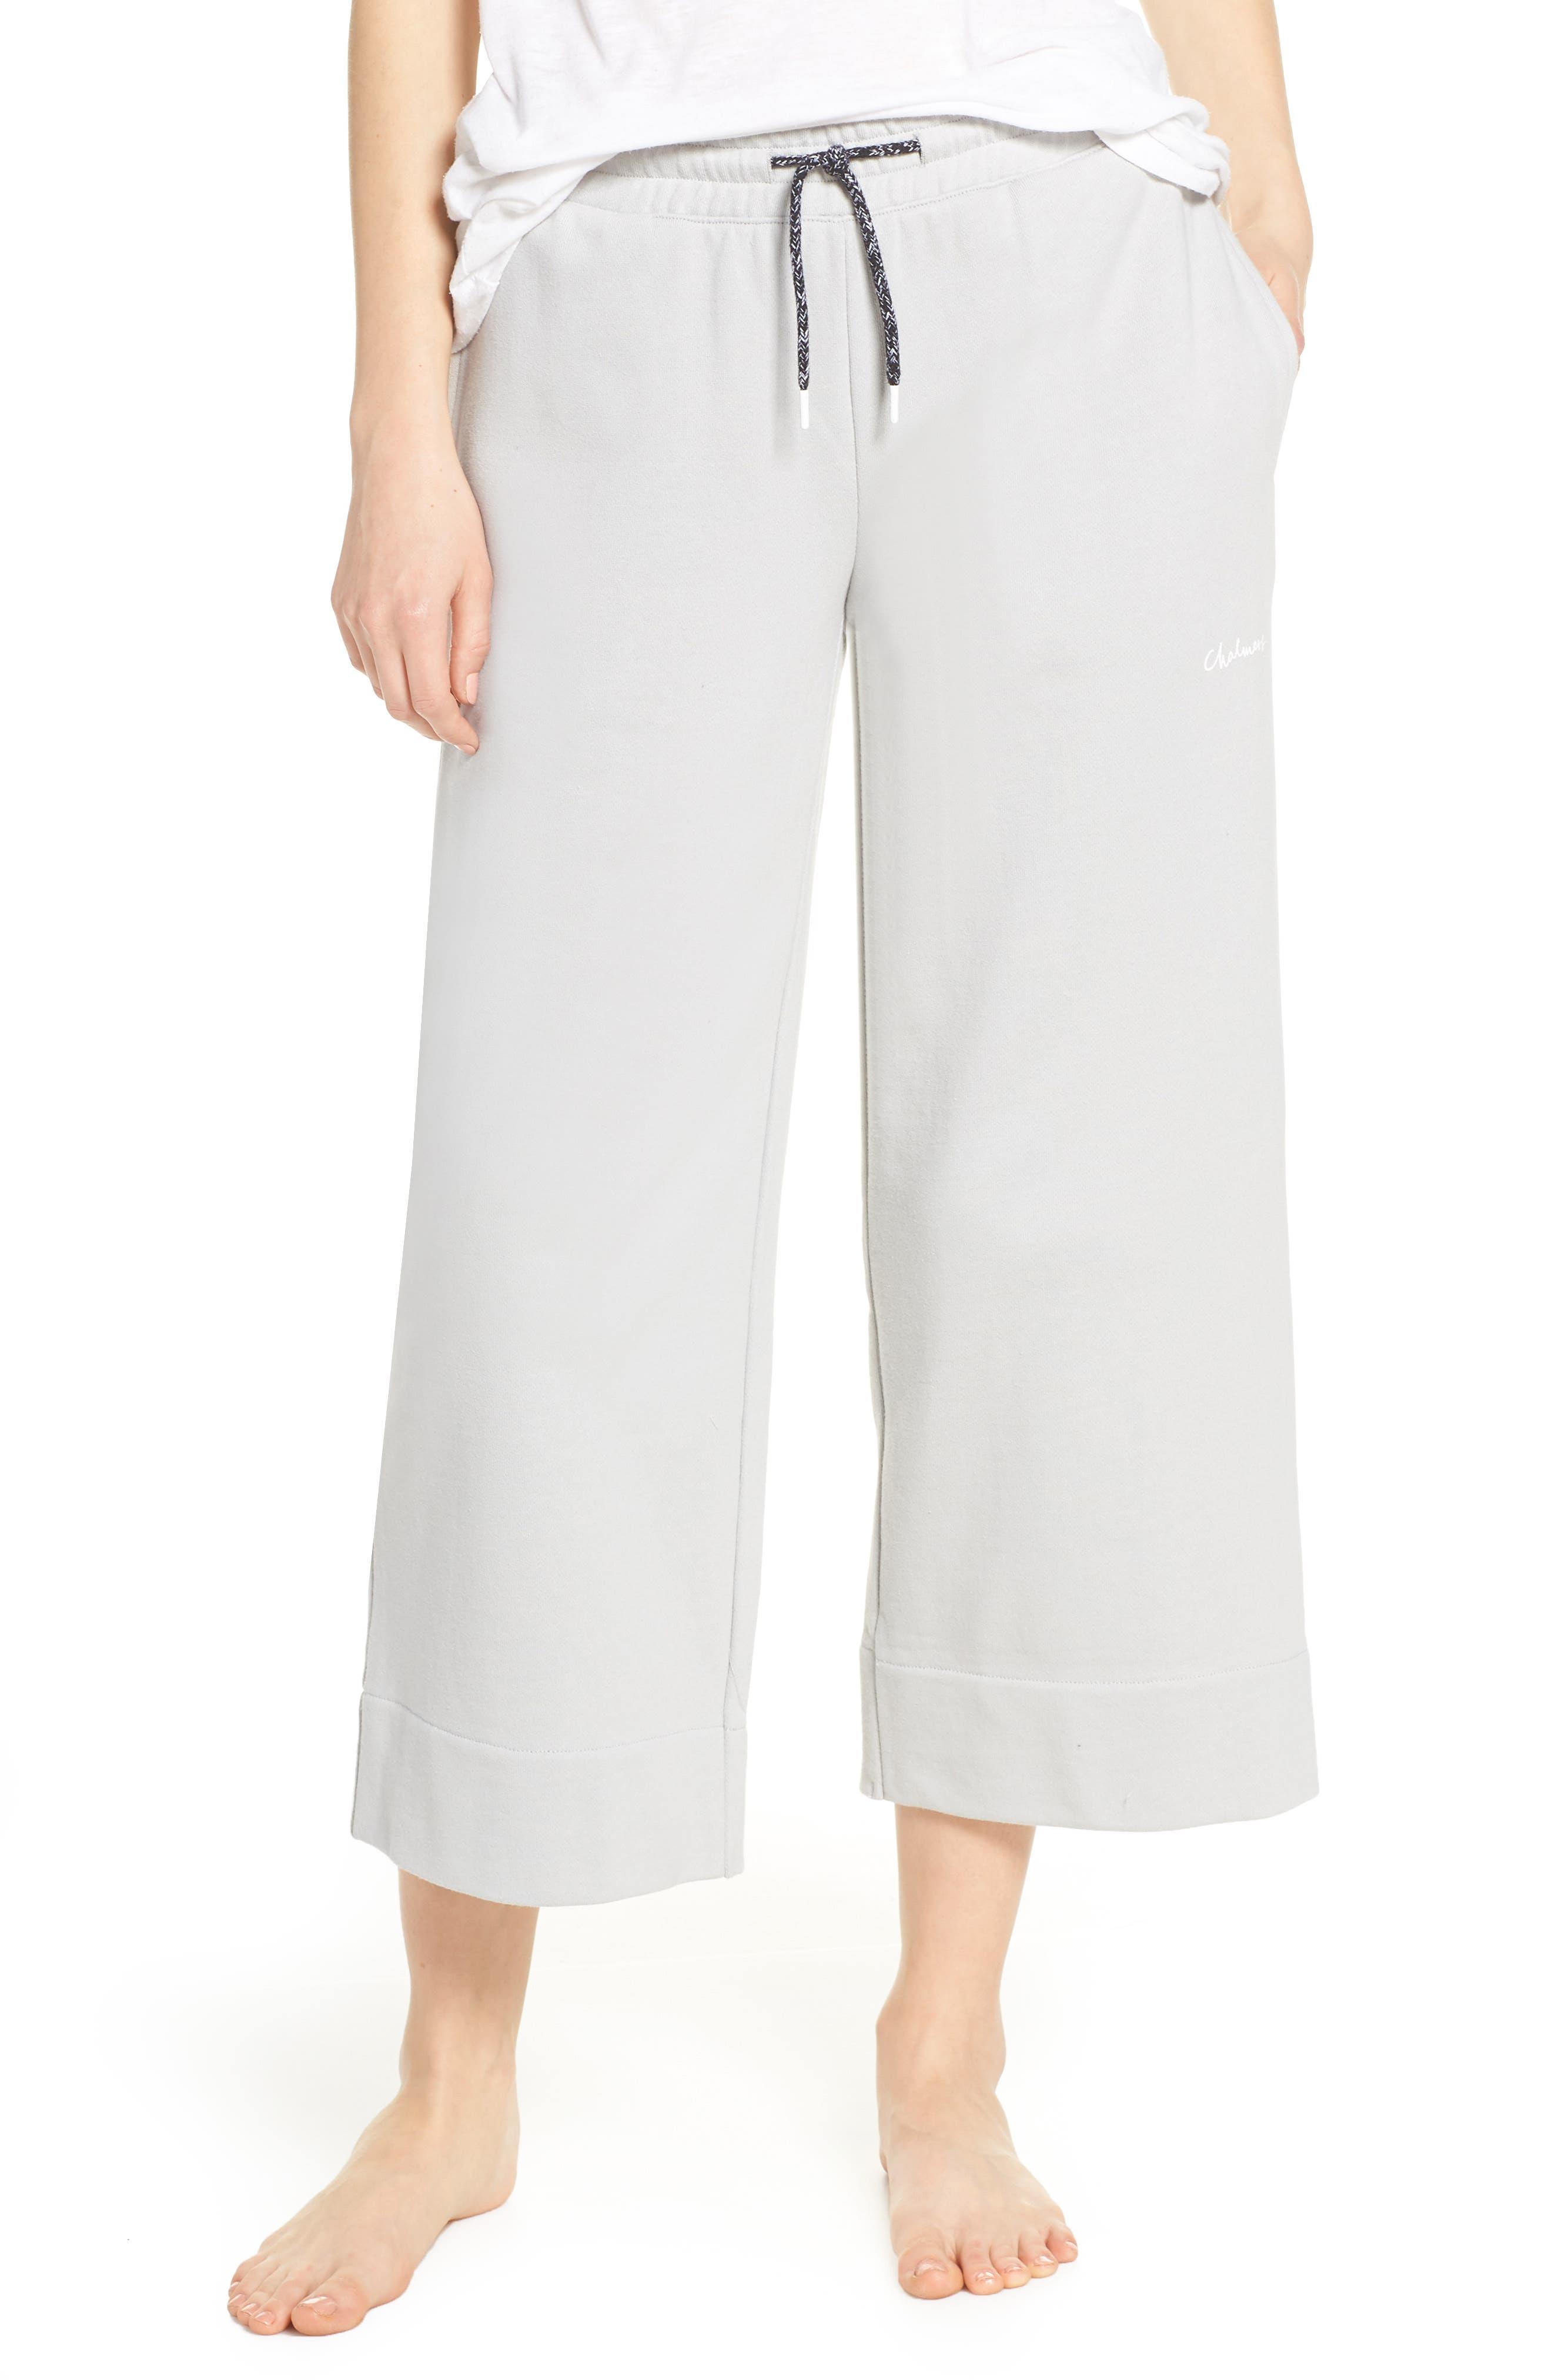 CHALMERS Vada Crop Sweatpants, Main, color, SMOKE TERRY